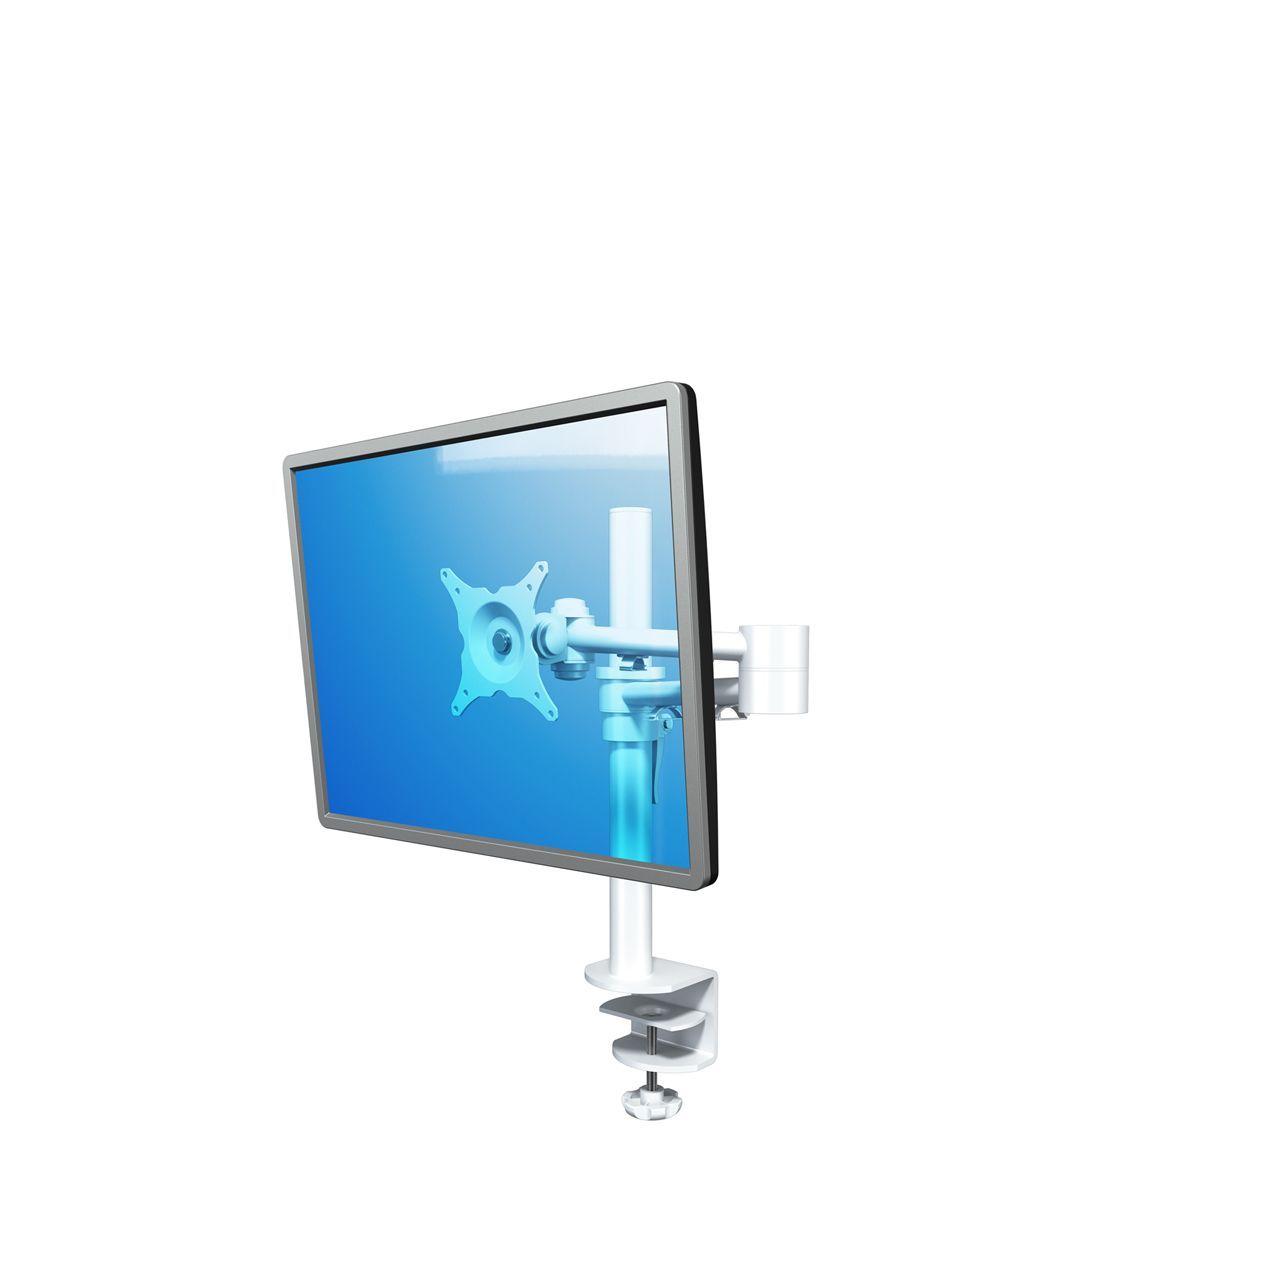 viewmate ecoline monitorarm flatscreen en monitorsteunen ERKAVME01 Categorie